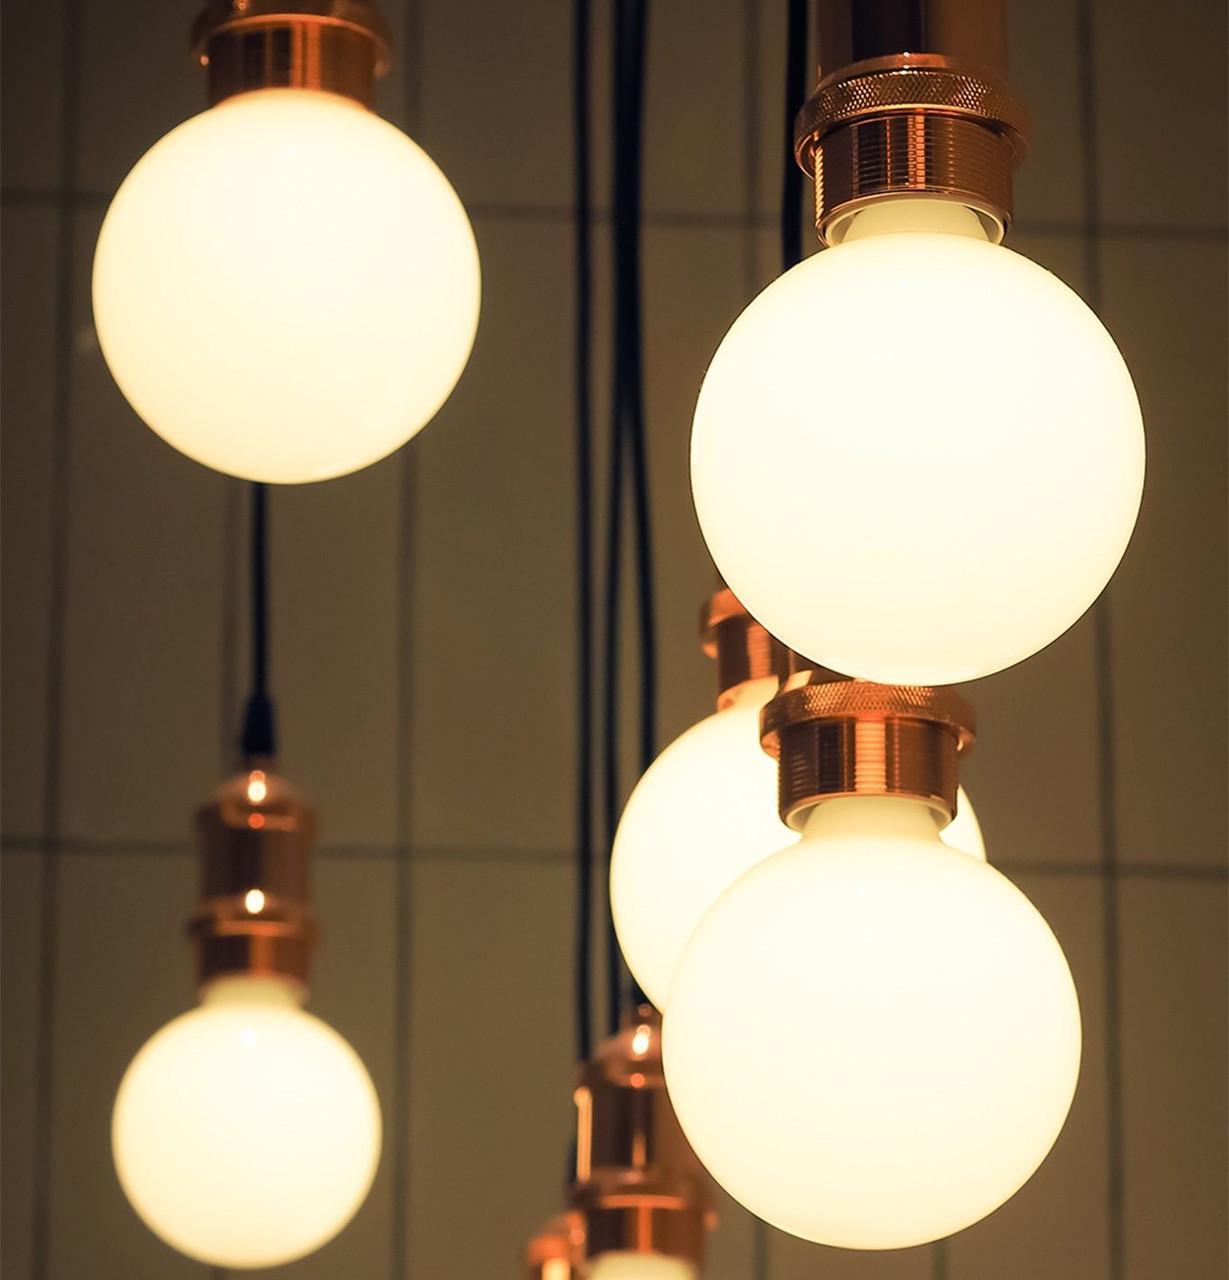 LED Dimmable Globe Antique Bronze Light Bulbs